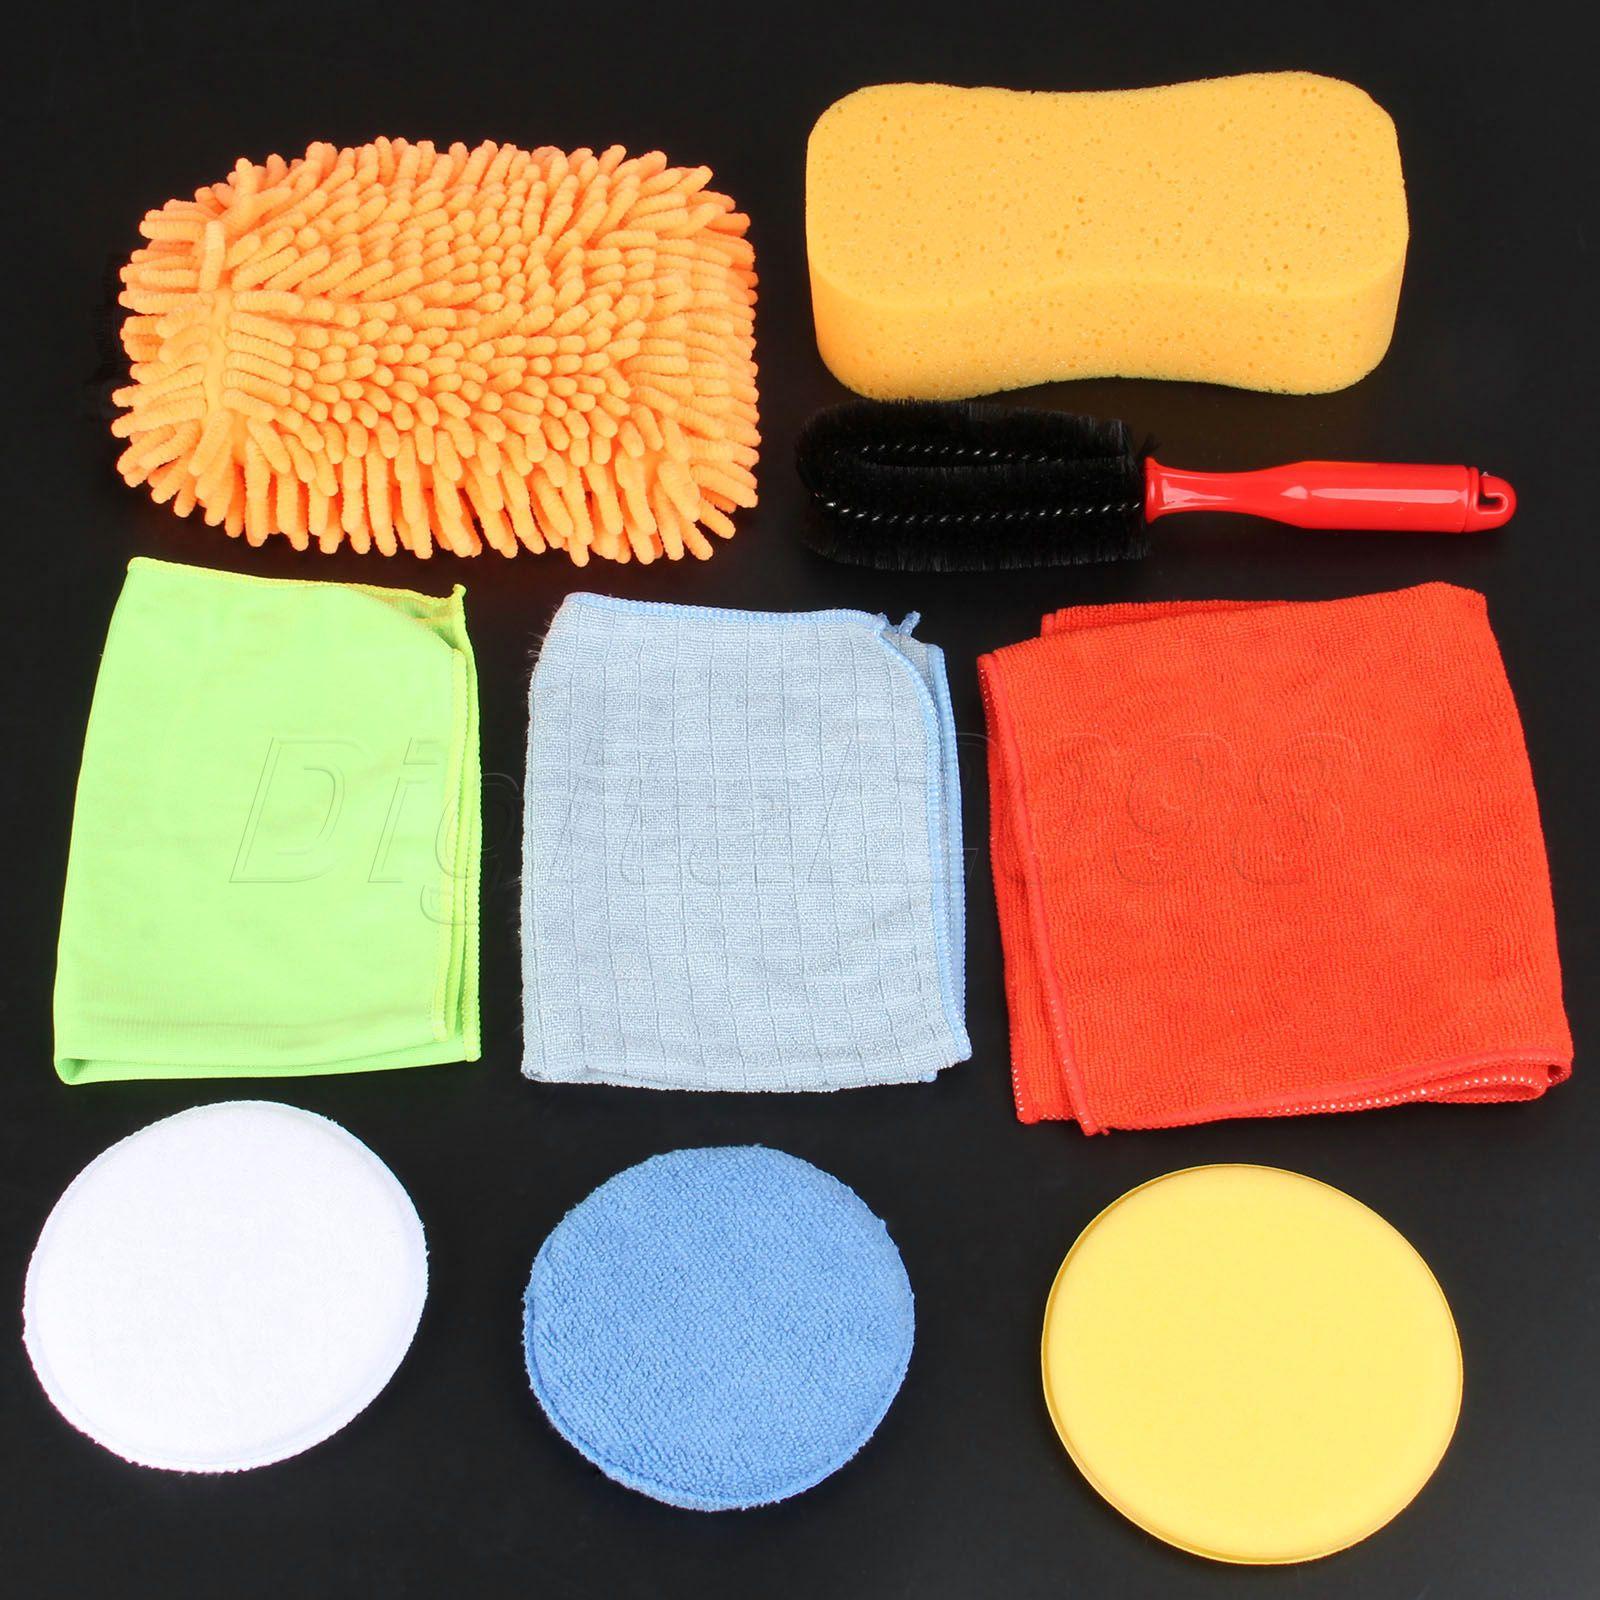 Yetaha Car Cleaning Washing Care Detailing Set Tools Tire Wheel Brush/Chenille Gloves/Towel/Sponge/ Waxing Pad Free Shipping